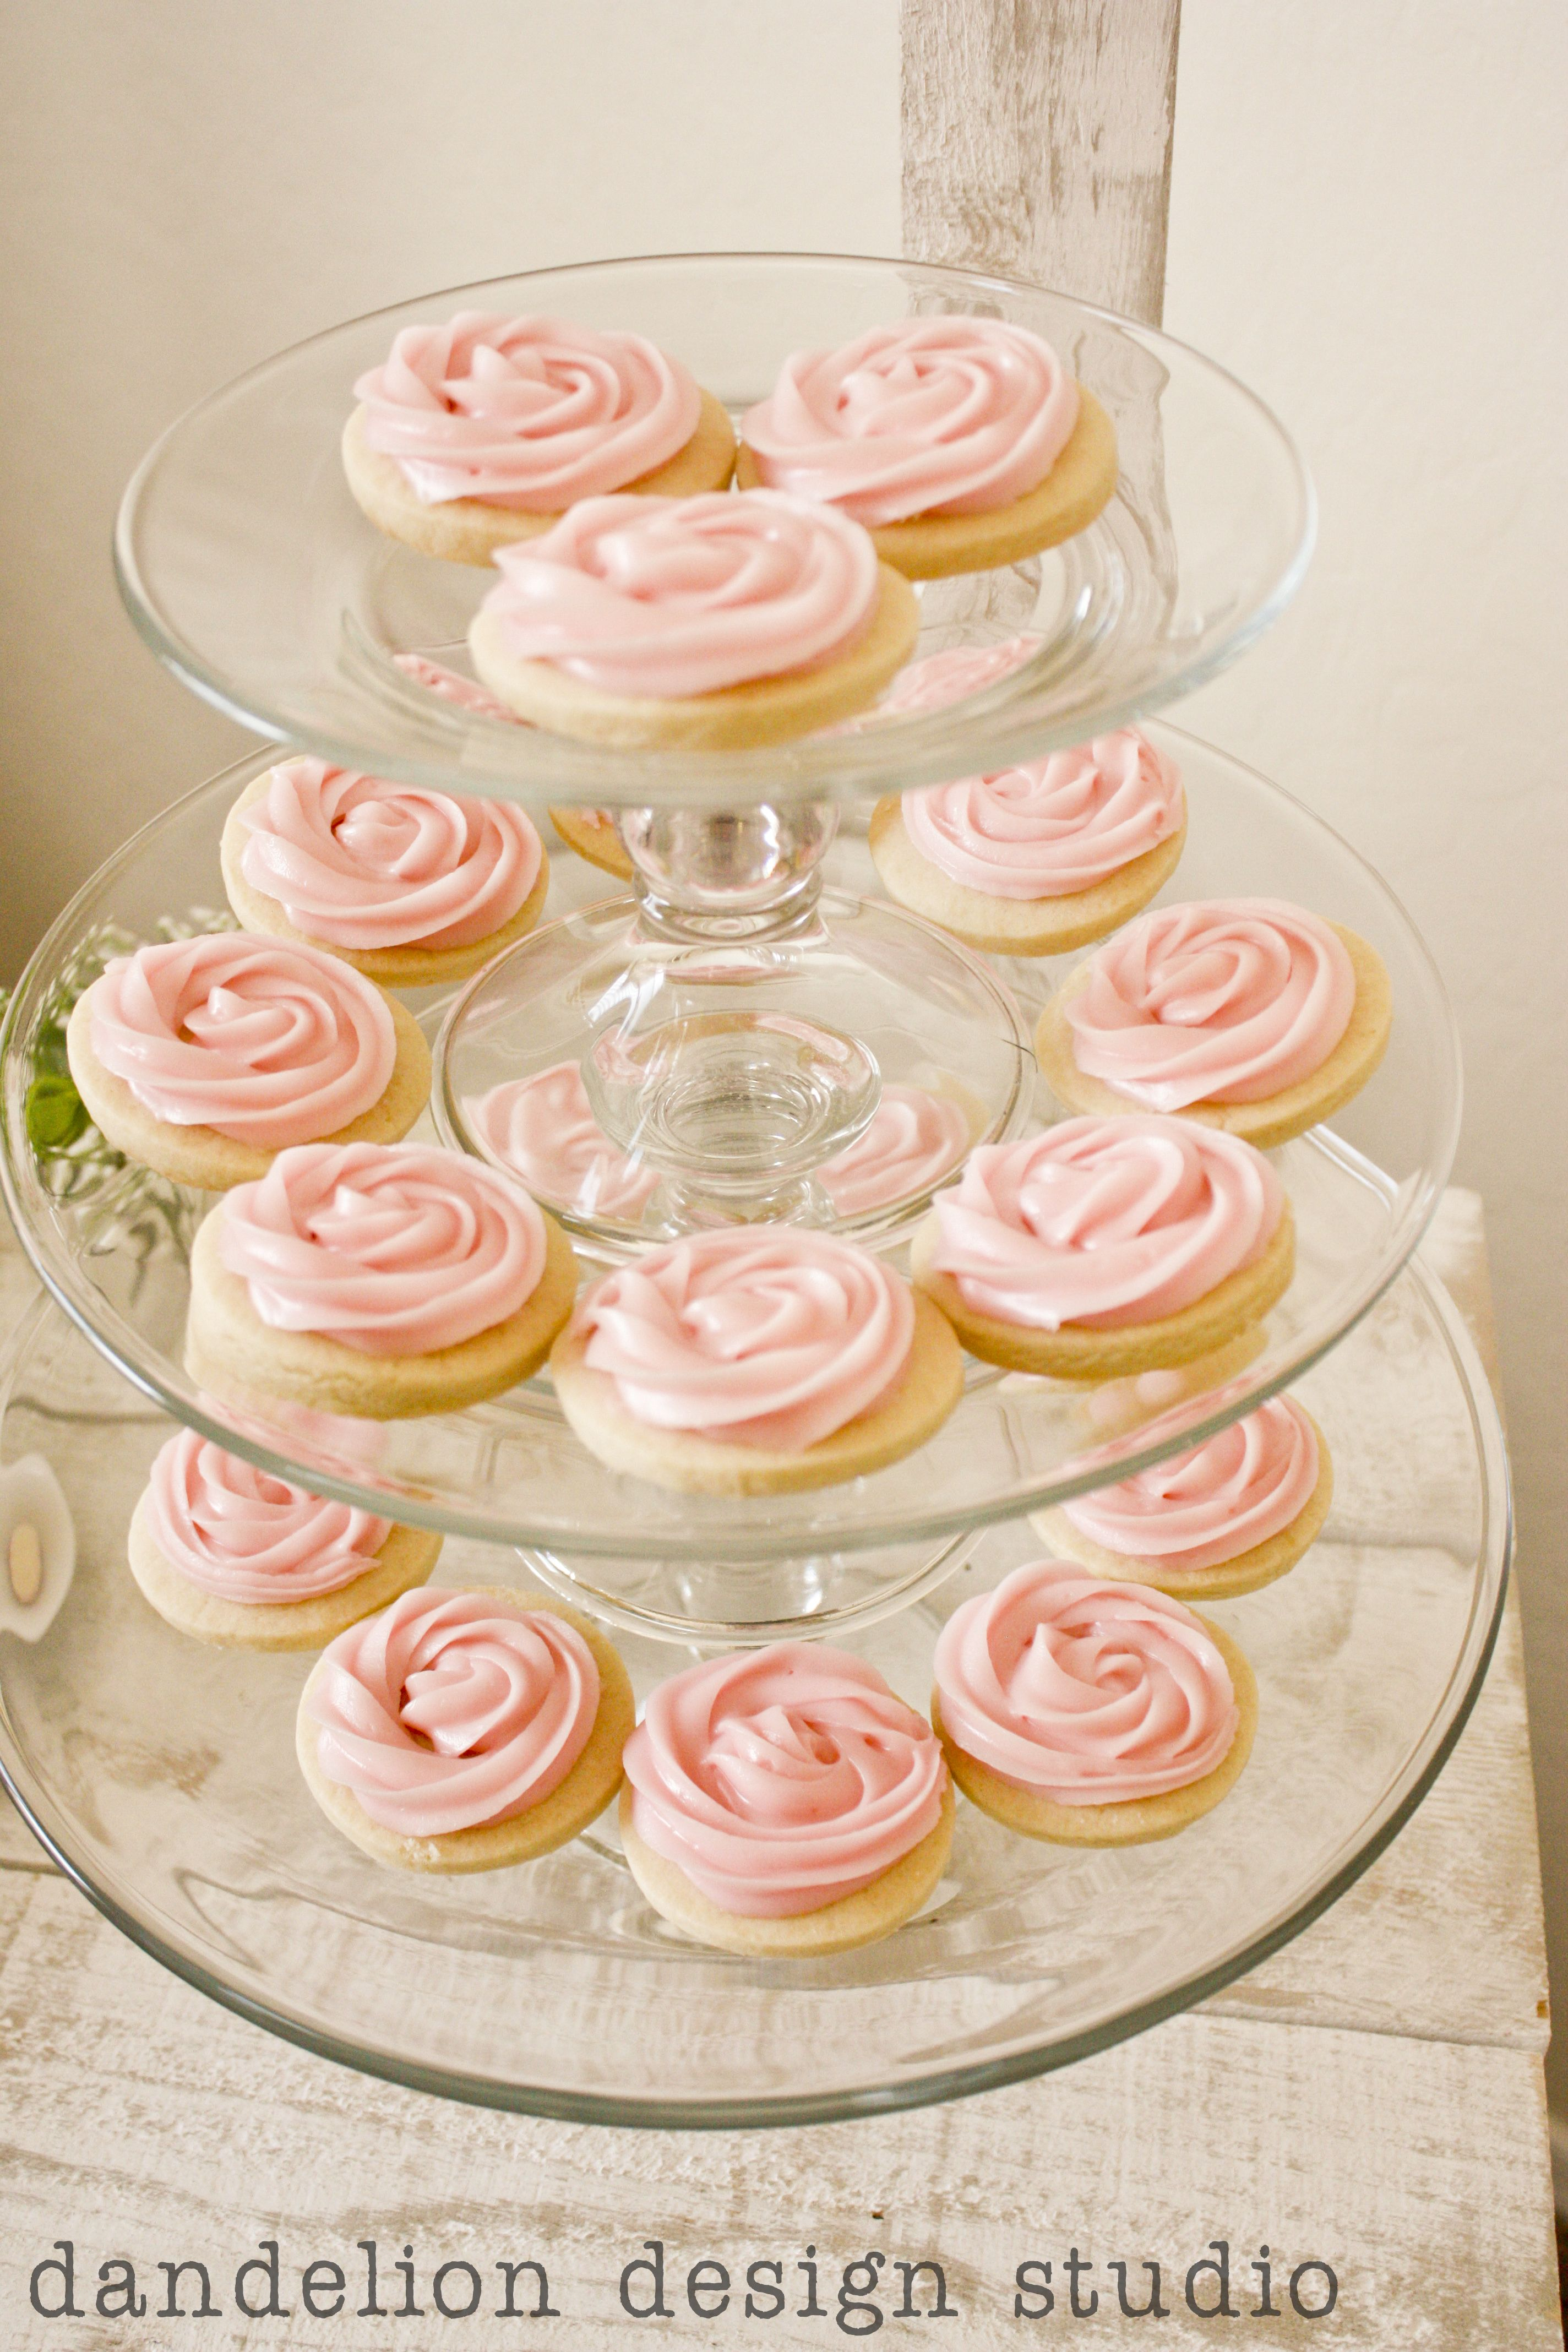 Pink Rose Sugar Cookies - Dandelion Design Studio